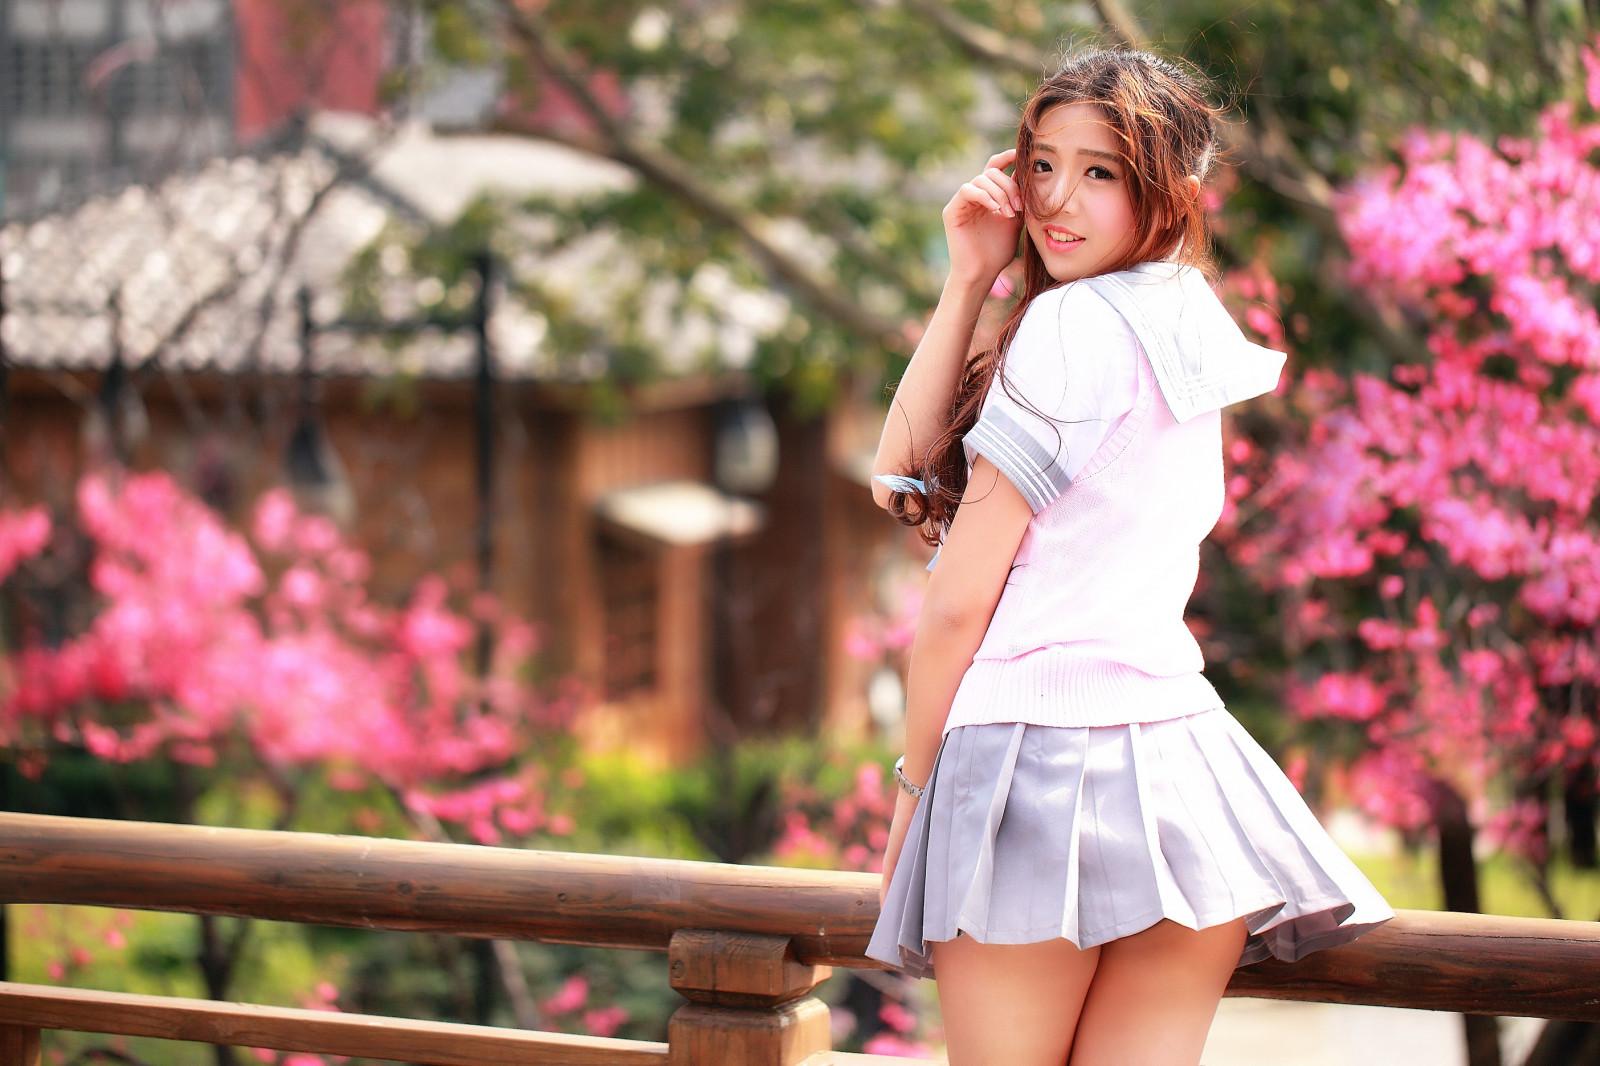 Girls in miniskirt photos #10